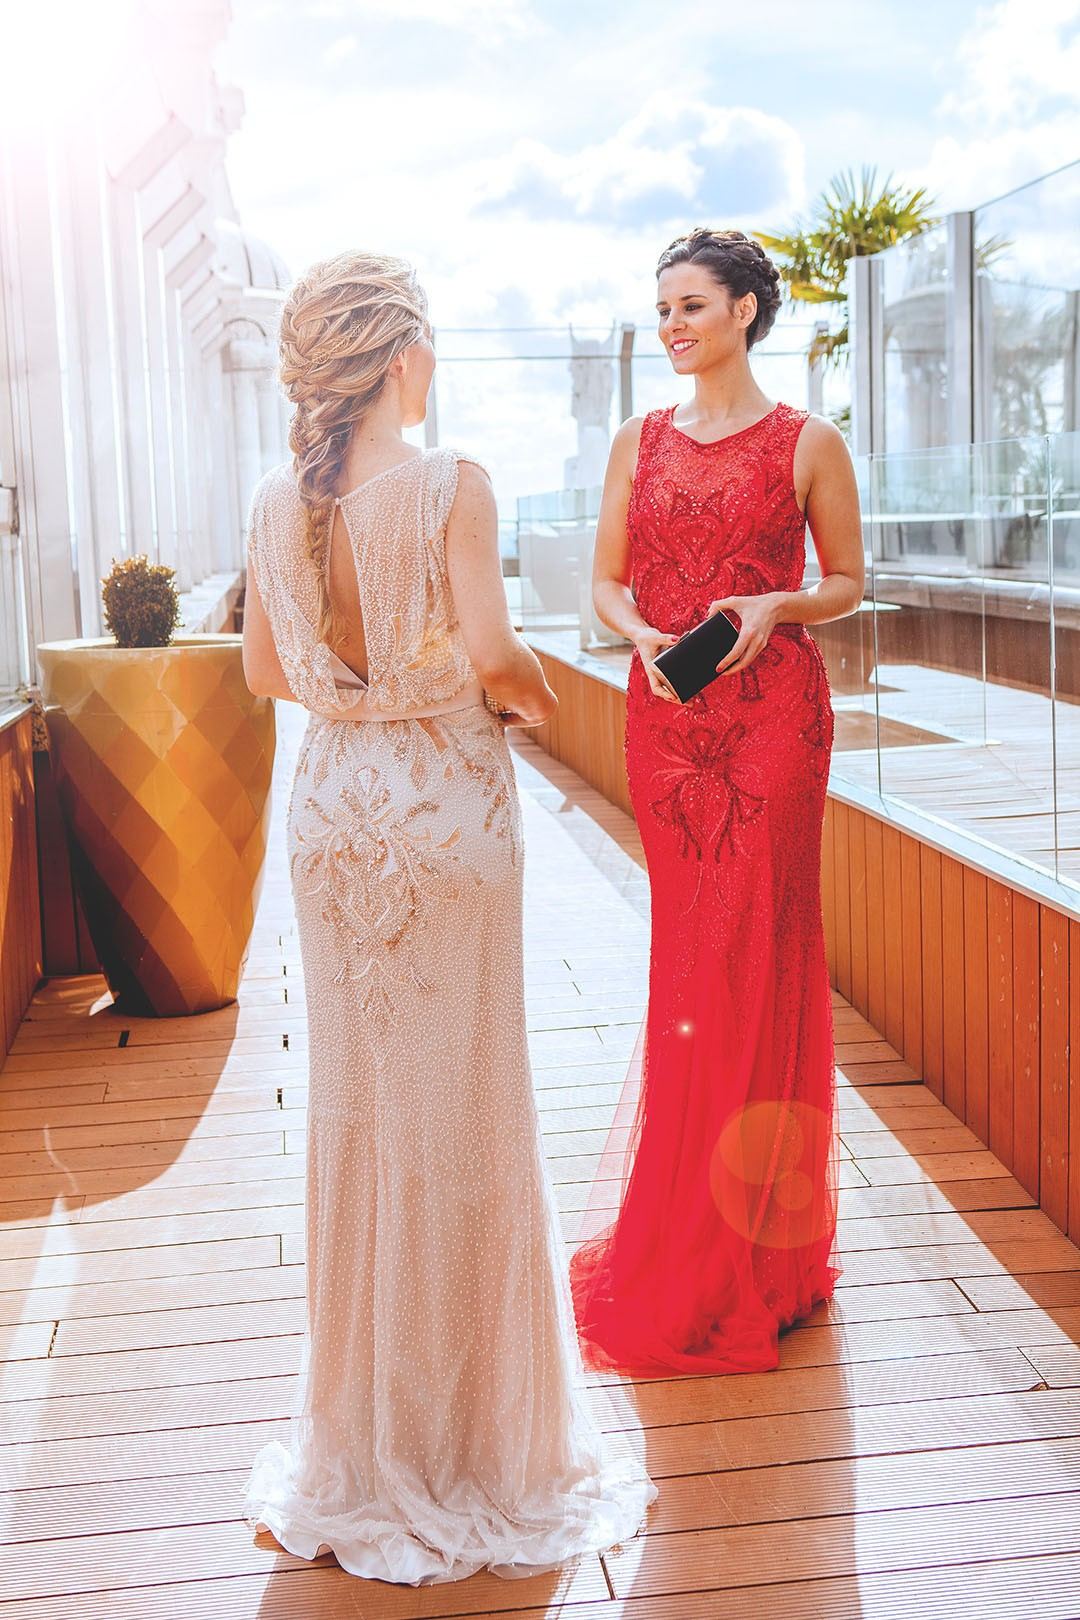 Monica-Sors-for-Aire-Barcelona-dress